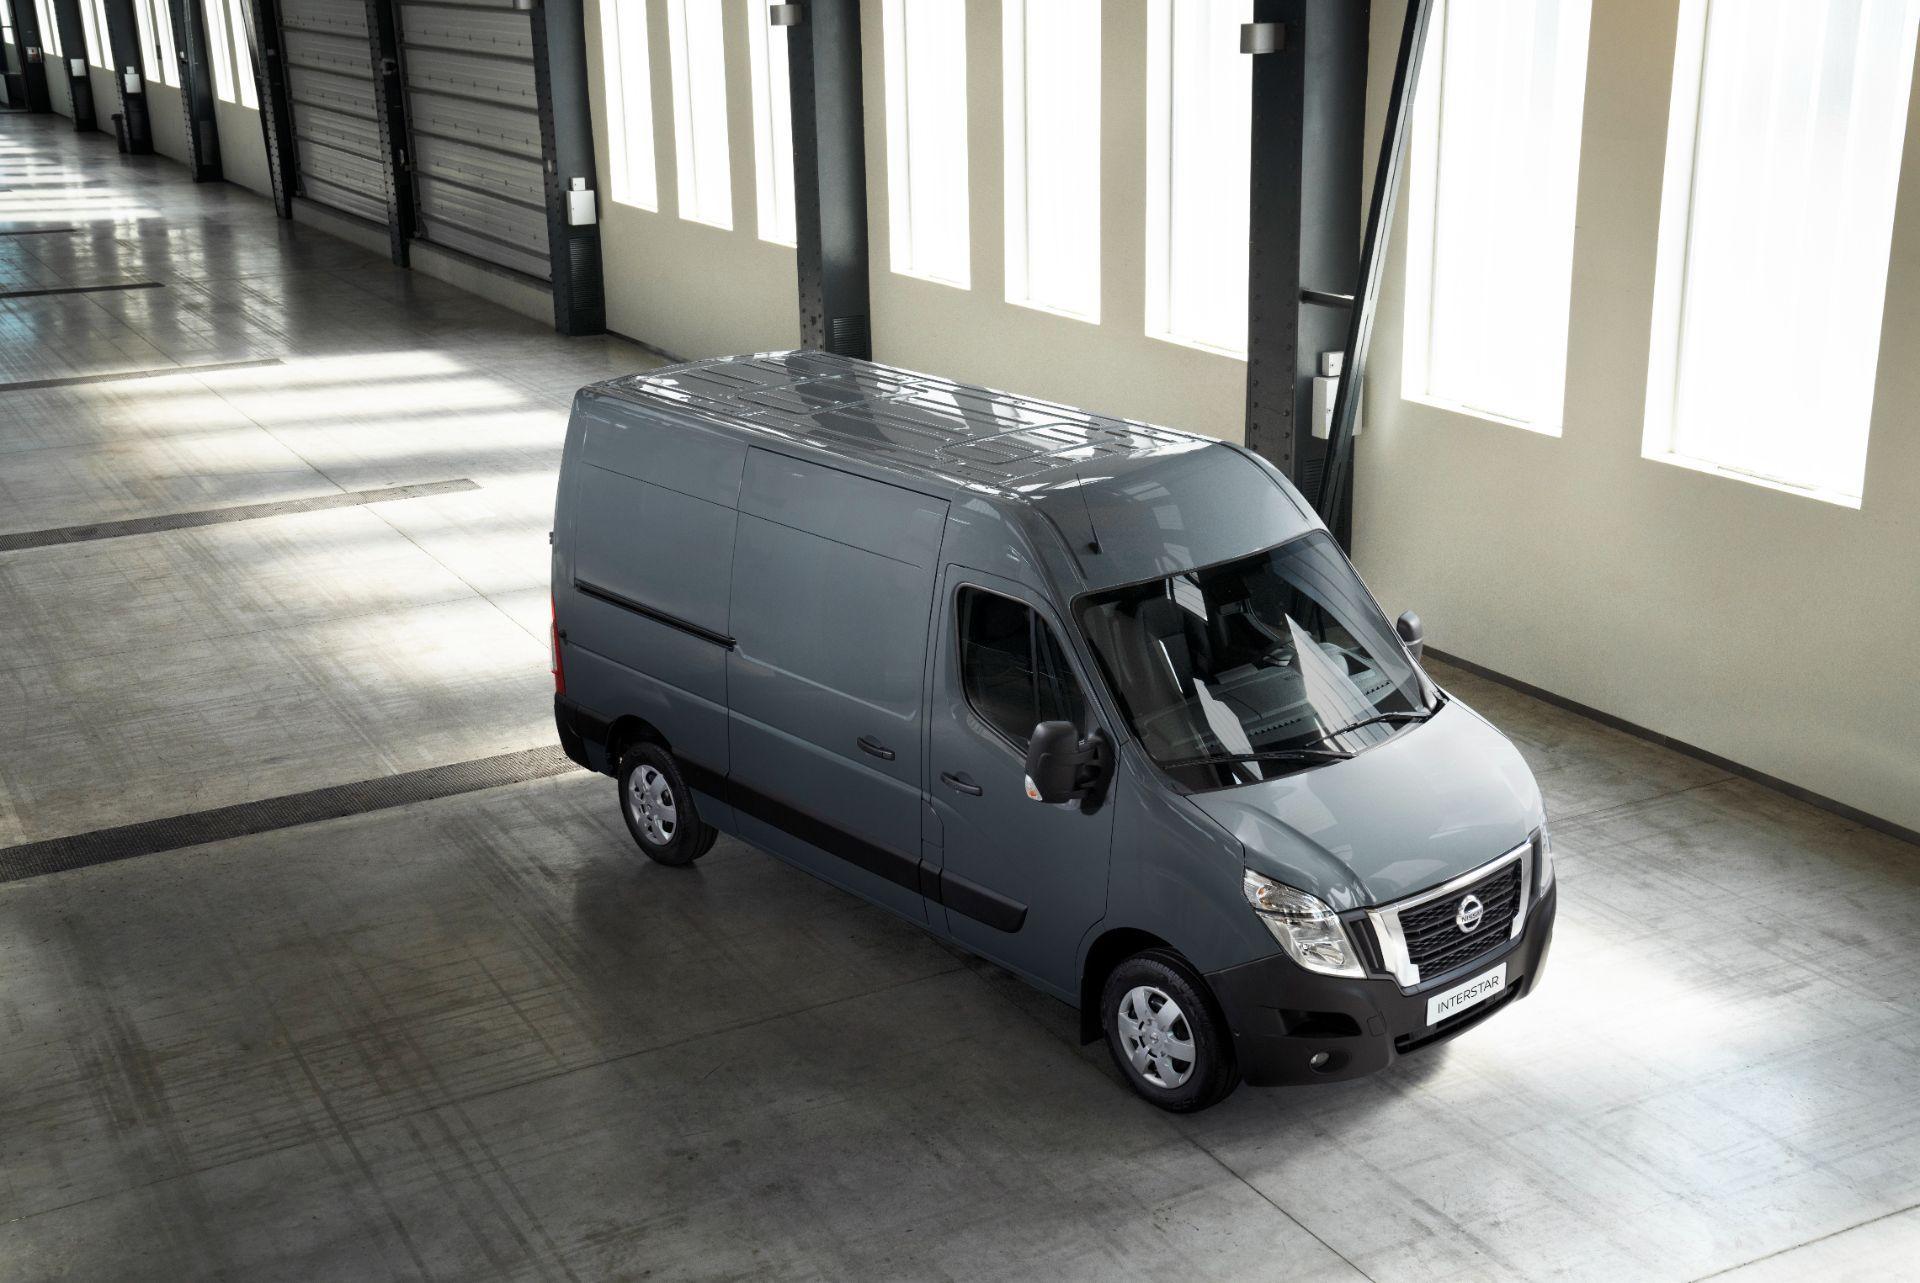 2022-Nissan-Interstar-Van-2